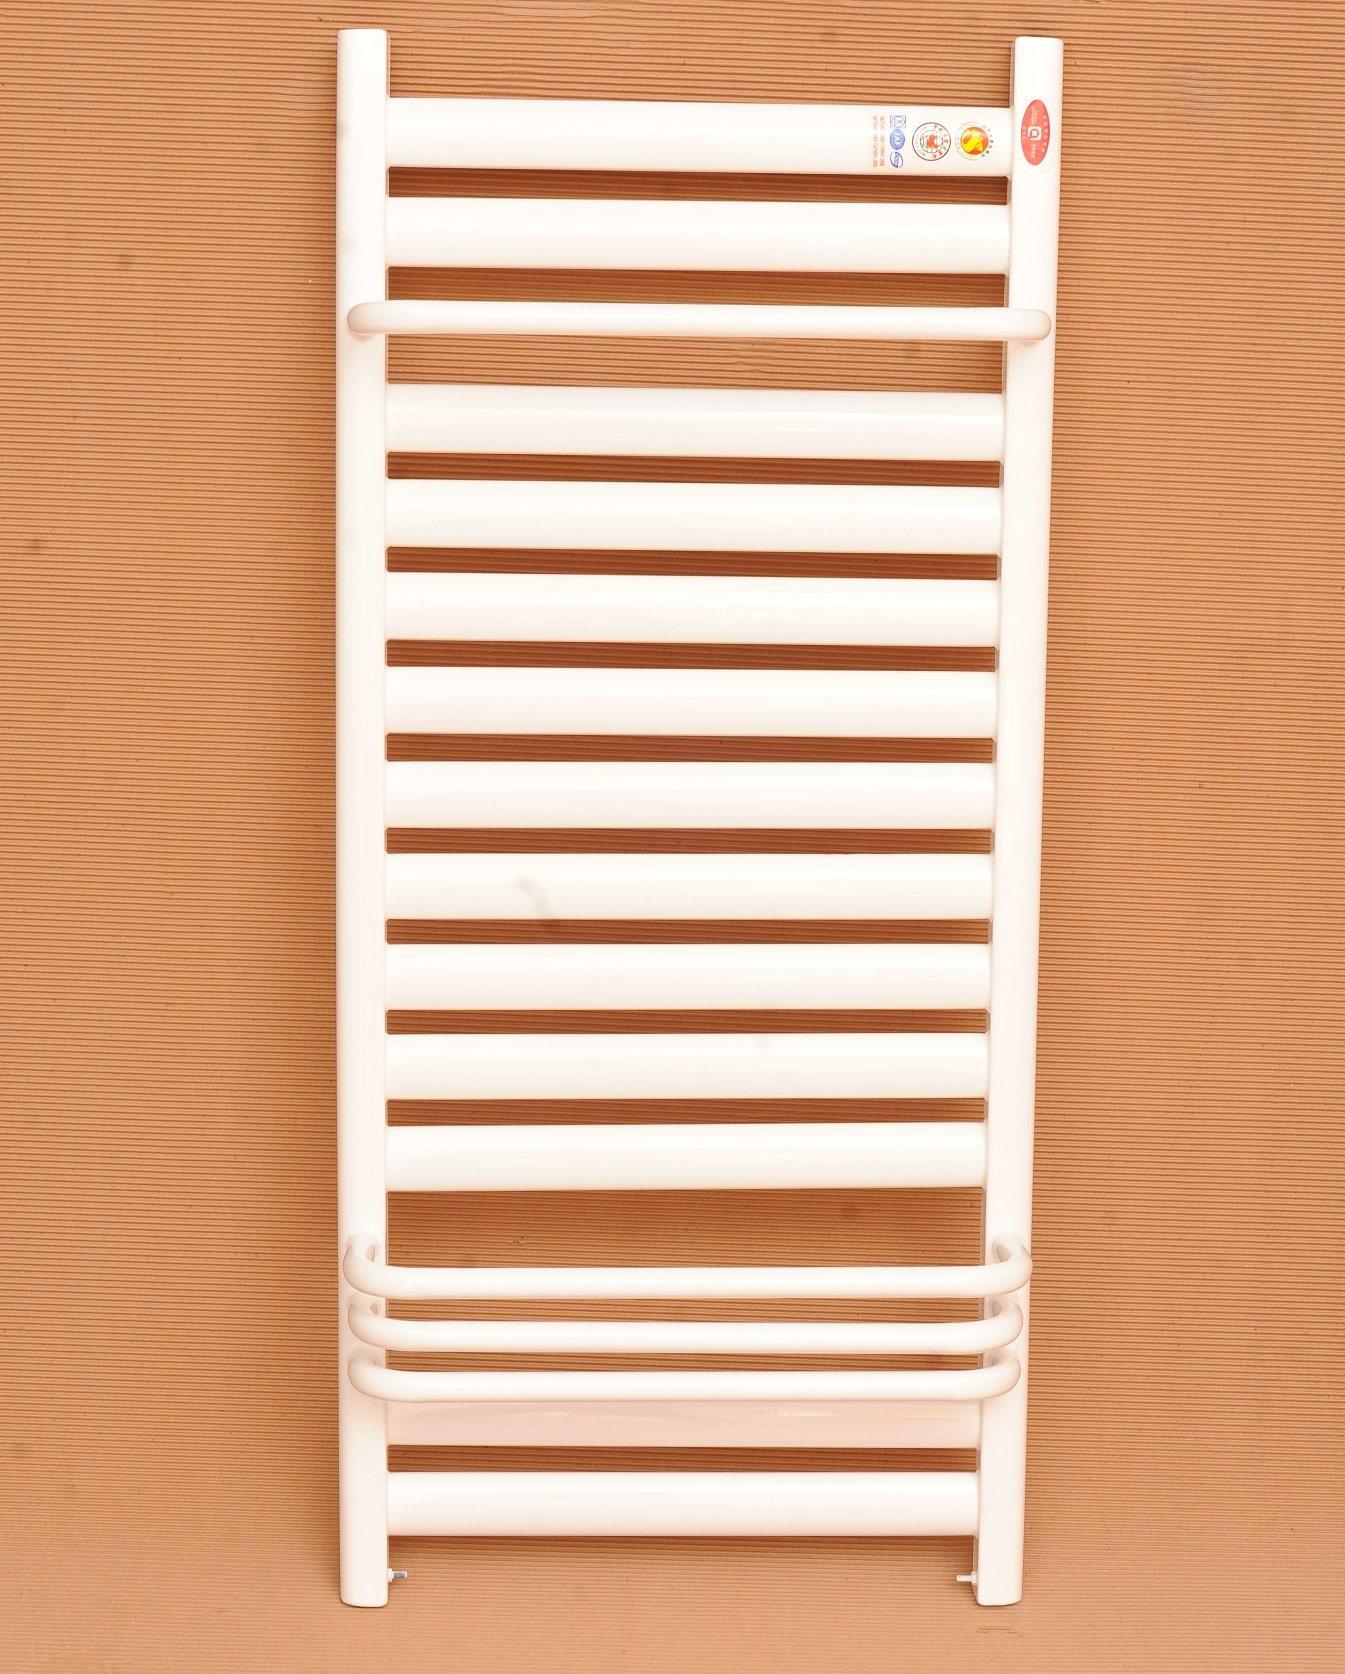 Bathroom Radiator/Copper-Aluminum Towel Radiator for Water Heating